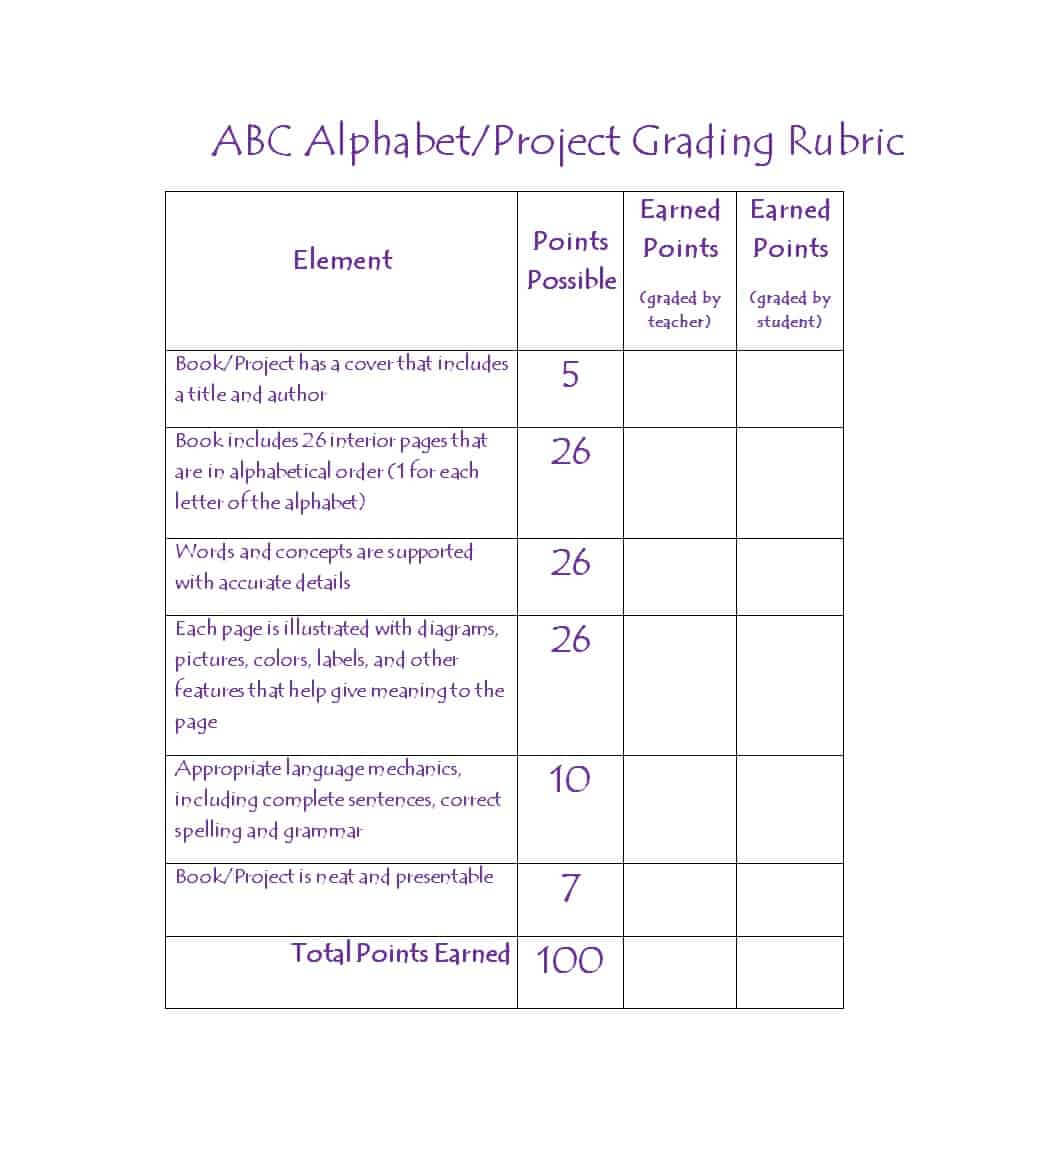 46 Editable Rubric Templates (Word Format) ᐅ Template Lab Intended For Blank Rubric Template